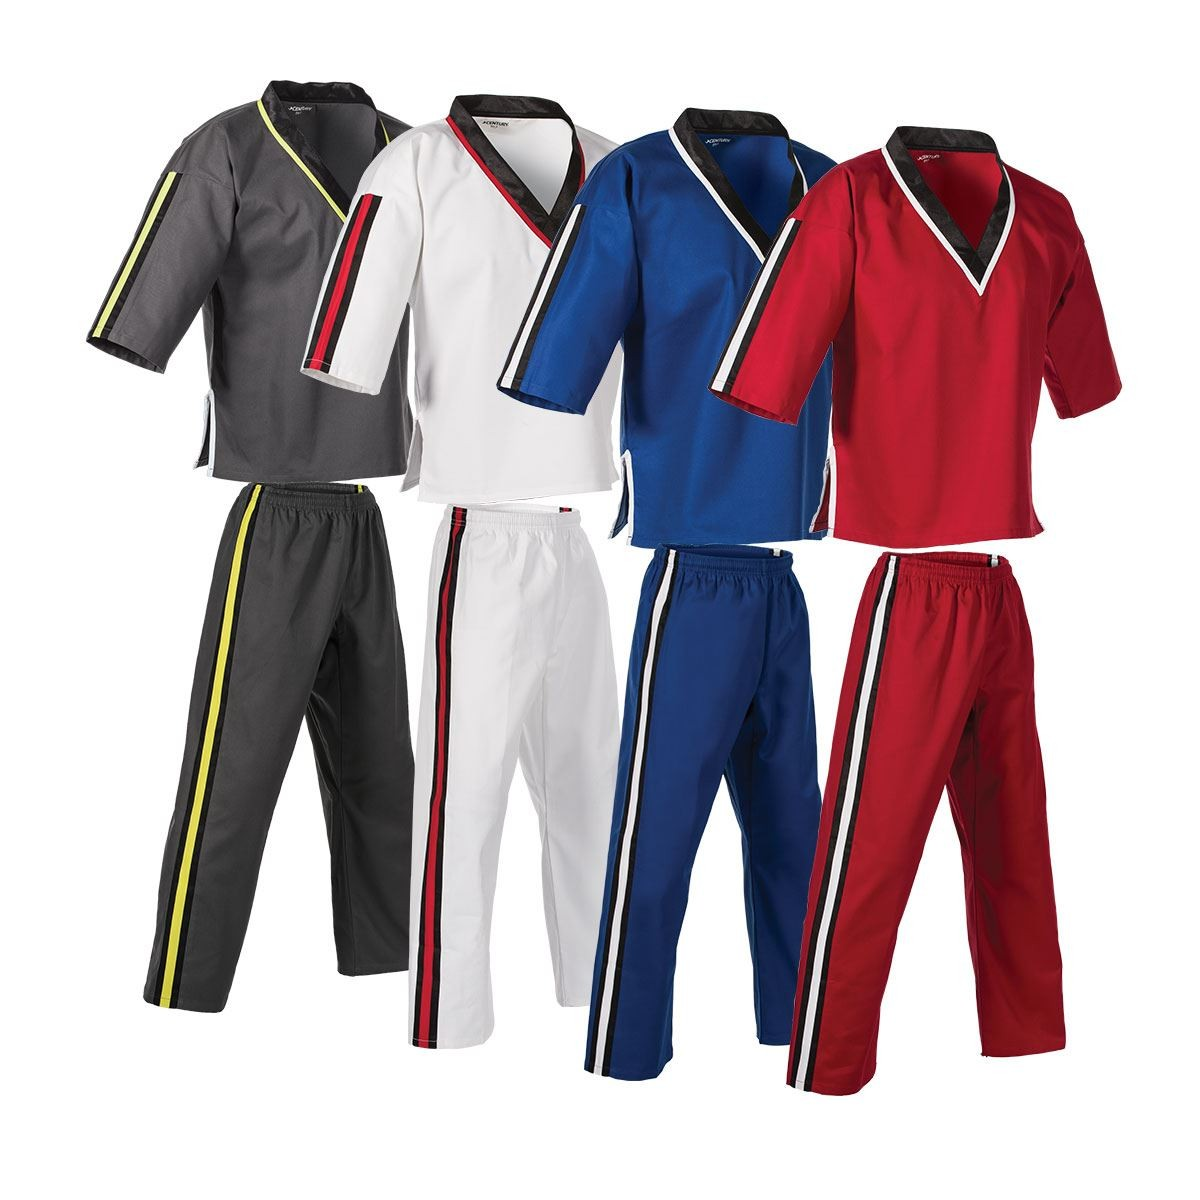 Century Martial Arts 7.25 oz. Pullover Program Uniform - Level 2